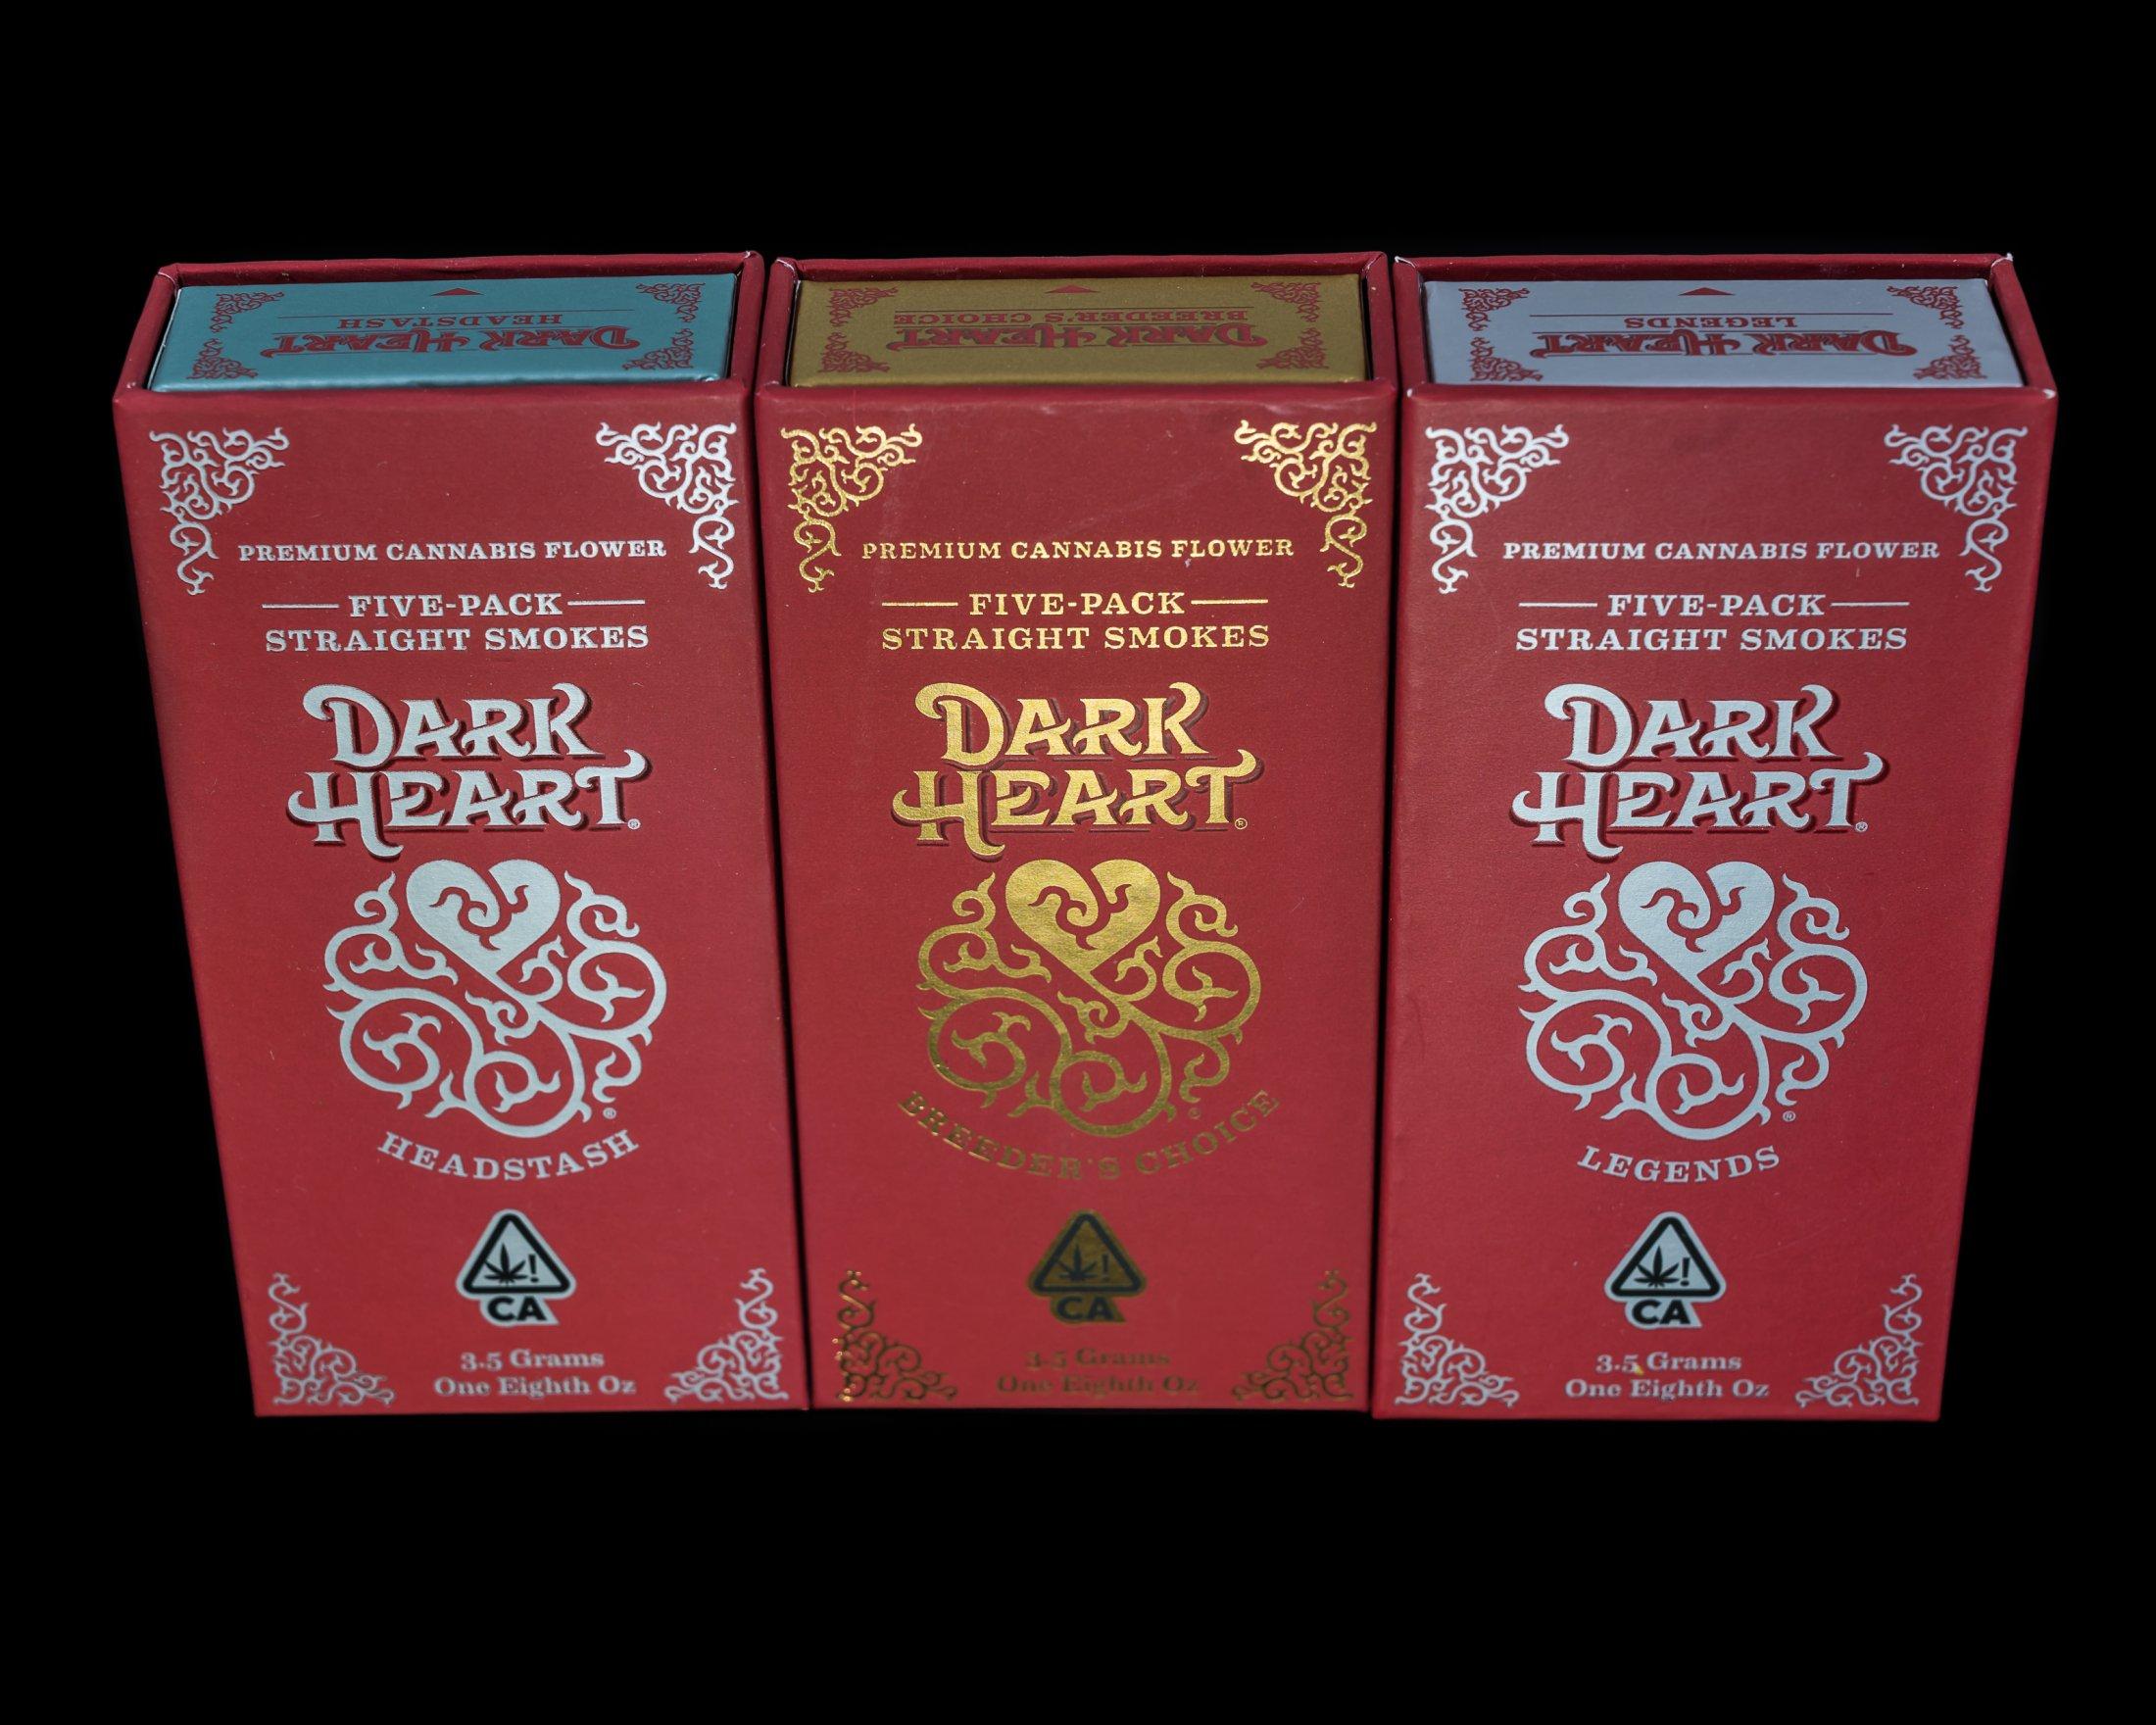 Dark Heart Nursery: Dark Heart Products